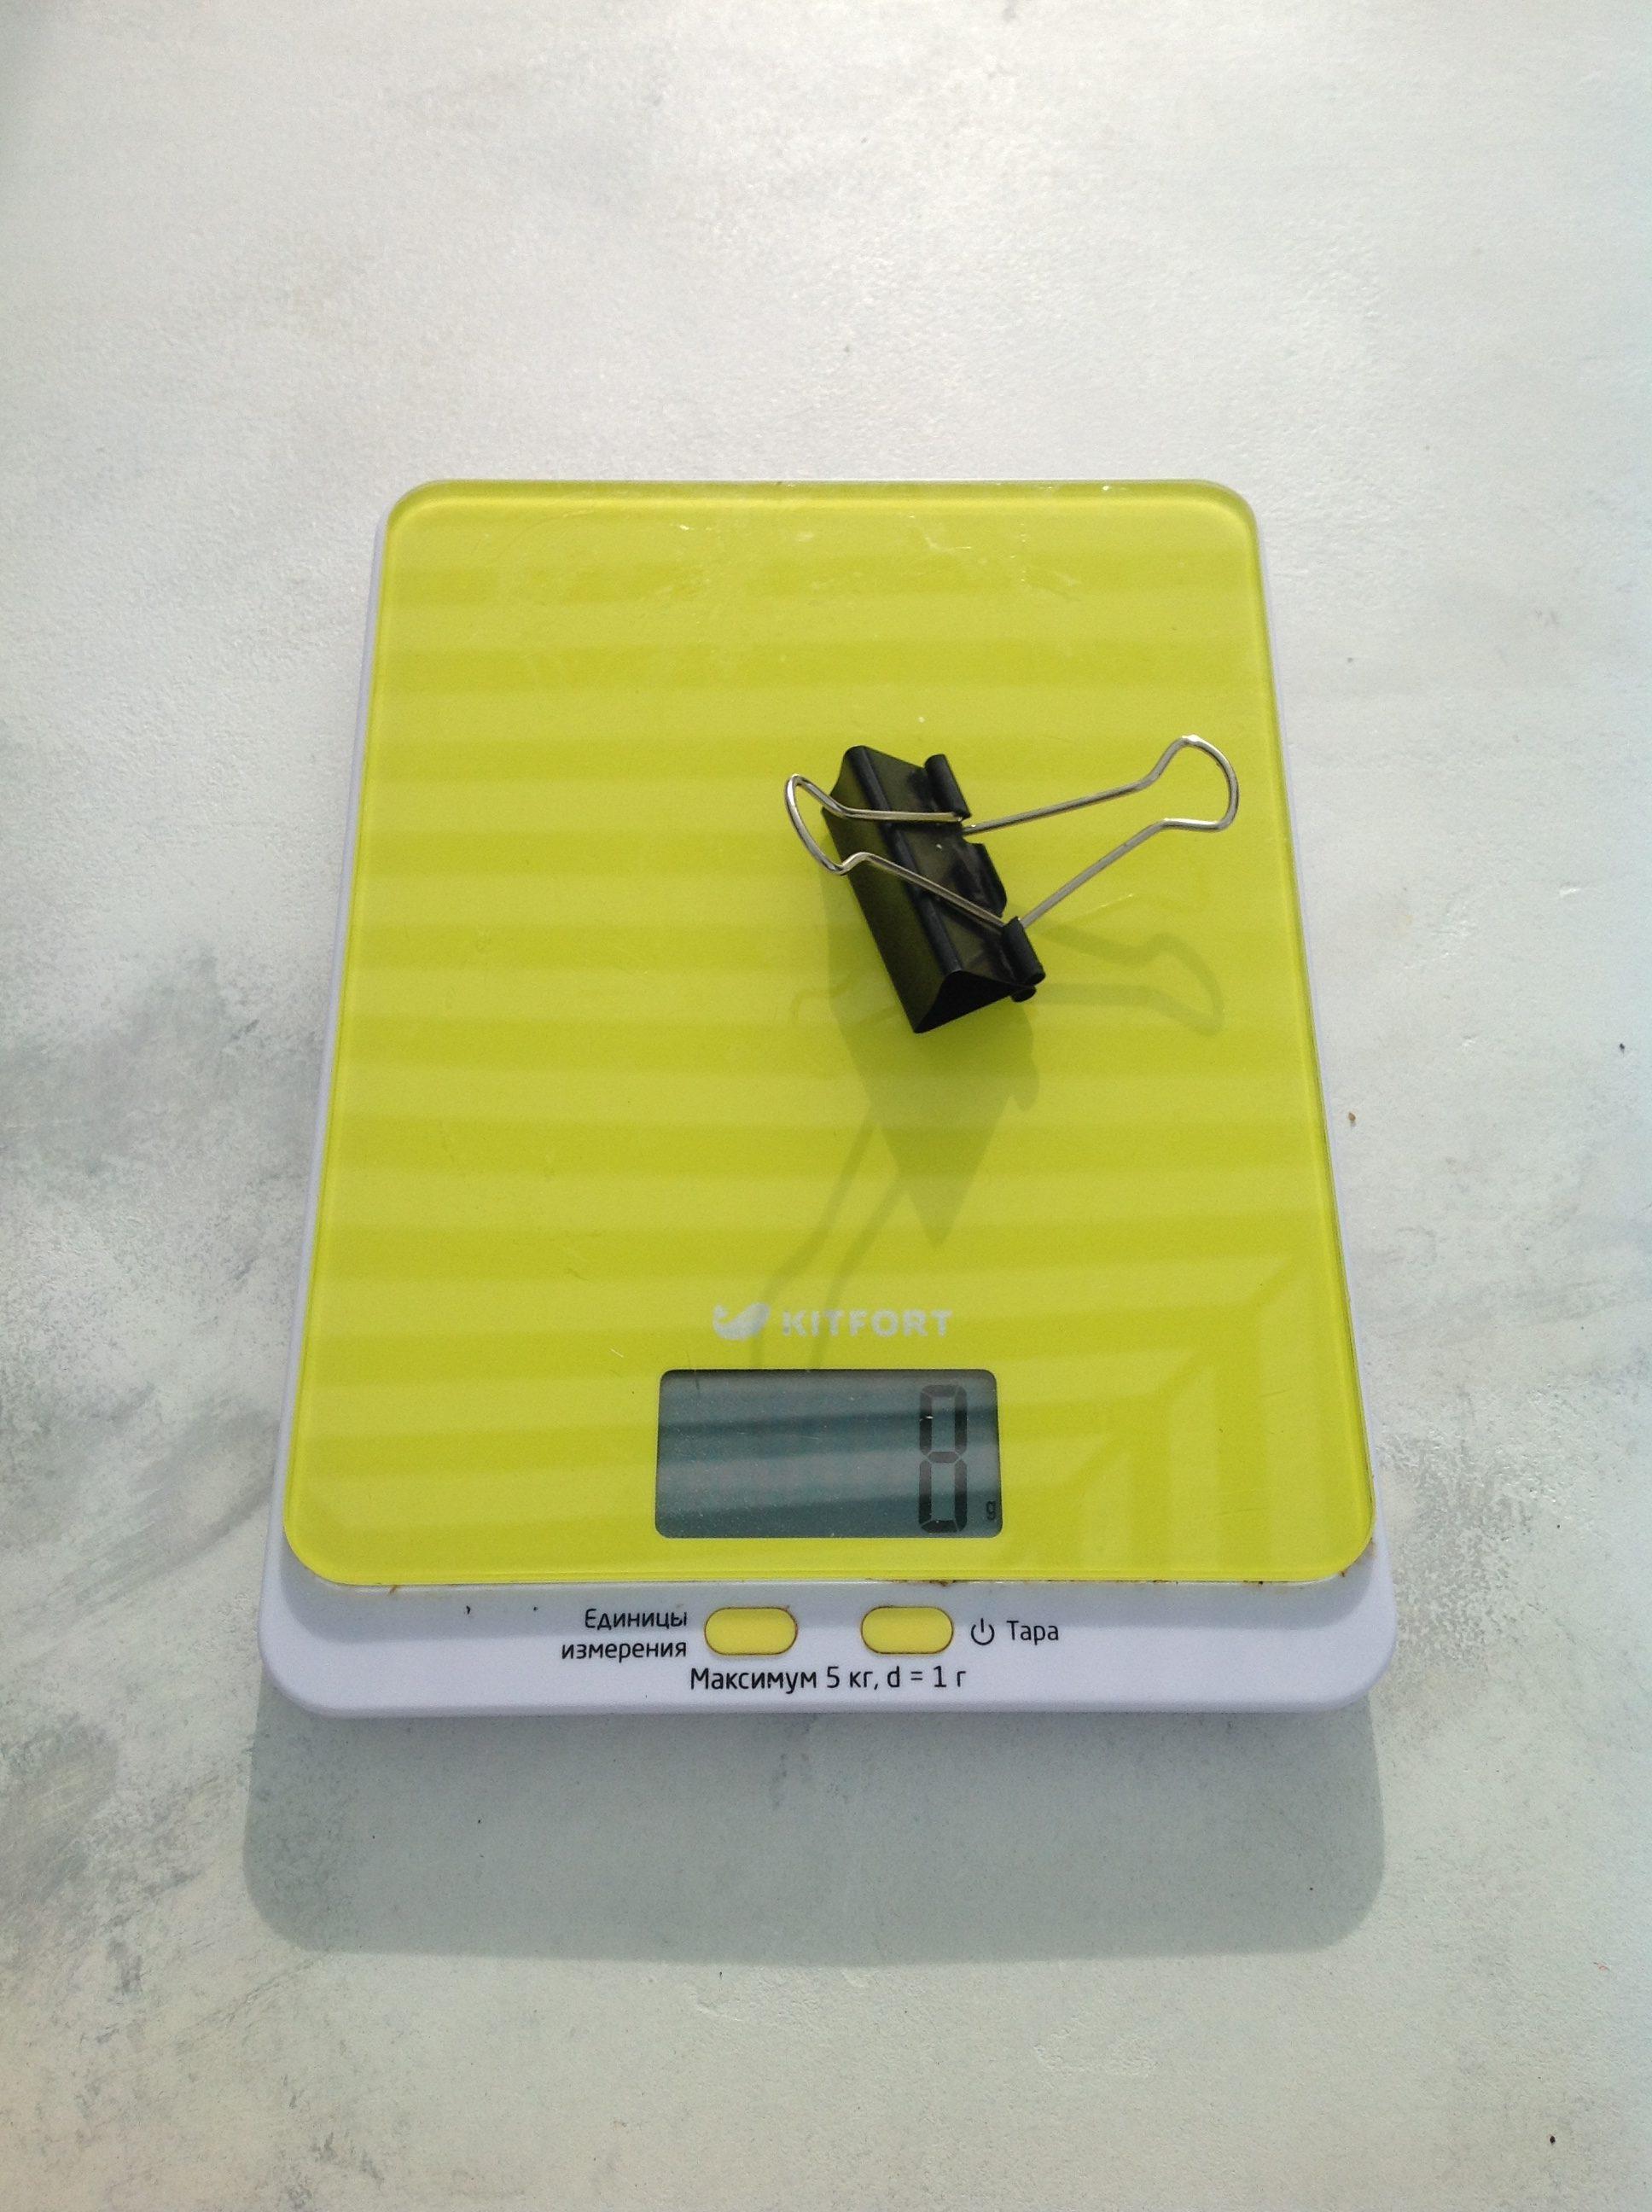 вес зажима канцелярского большого